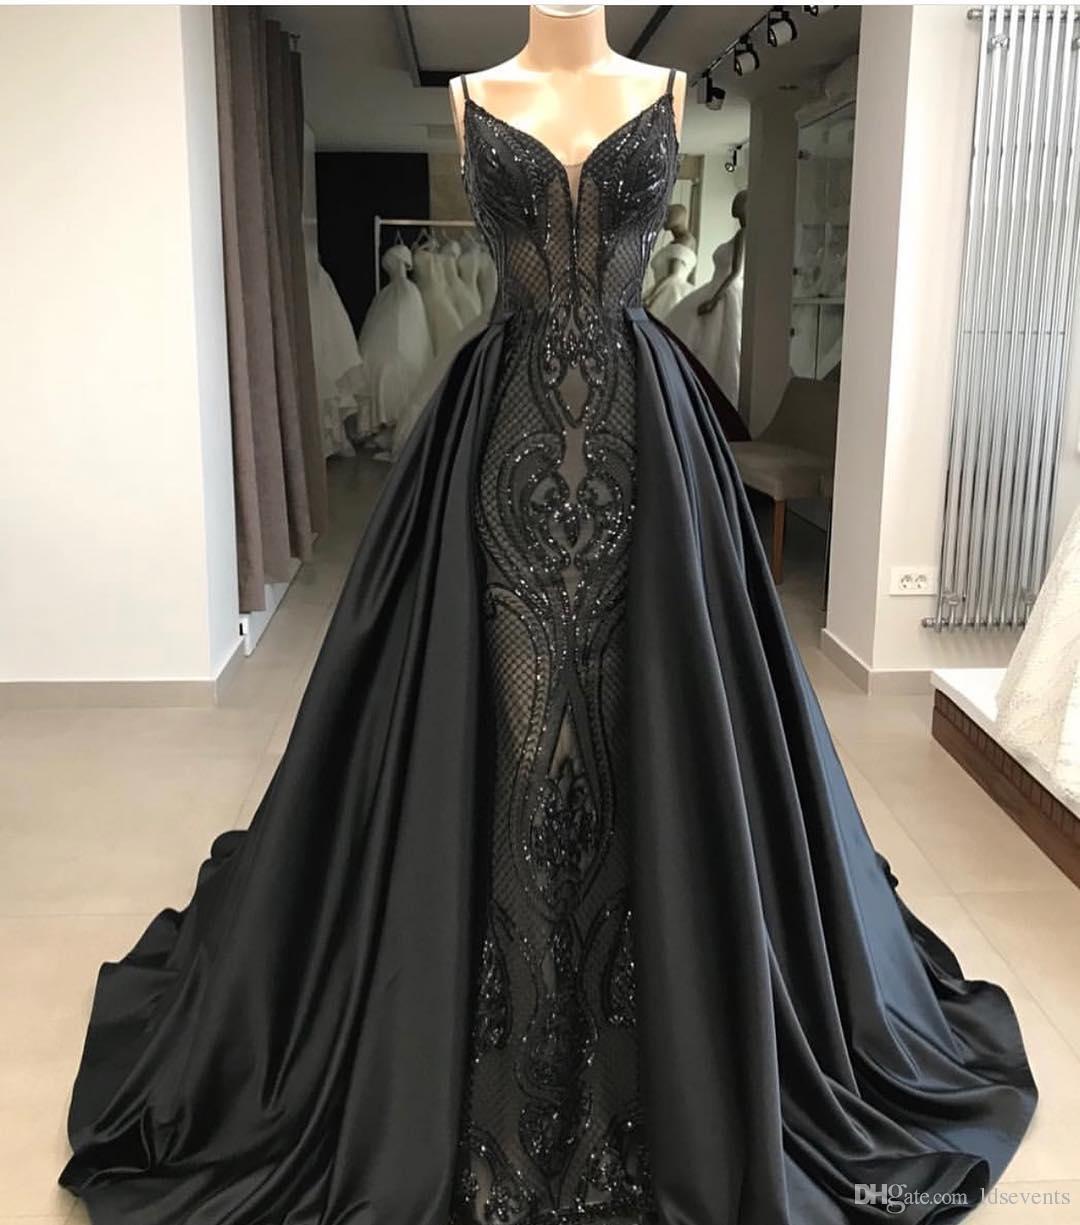 7c3a04c48fd49 African Black Evening Dresses Moroccan Kaftan Detachable Skirt Gowns Dubai  Turkish Arabic Aibye Prom Dress Abendkleider